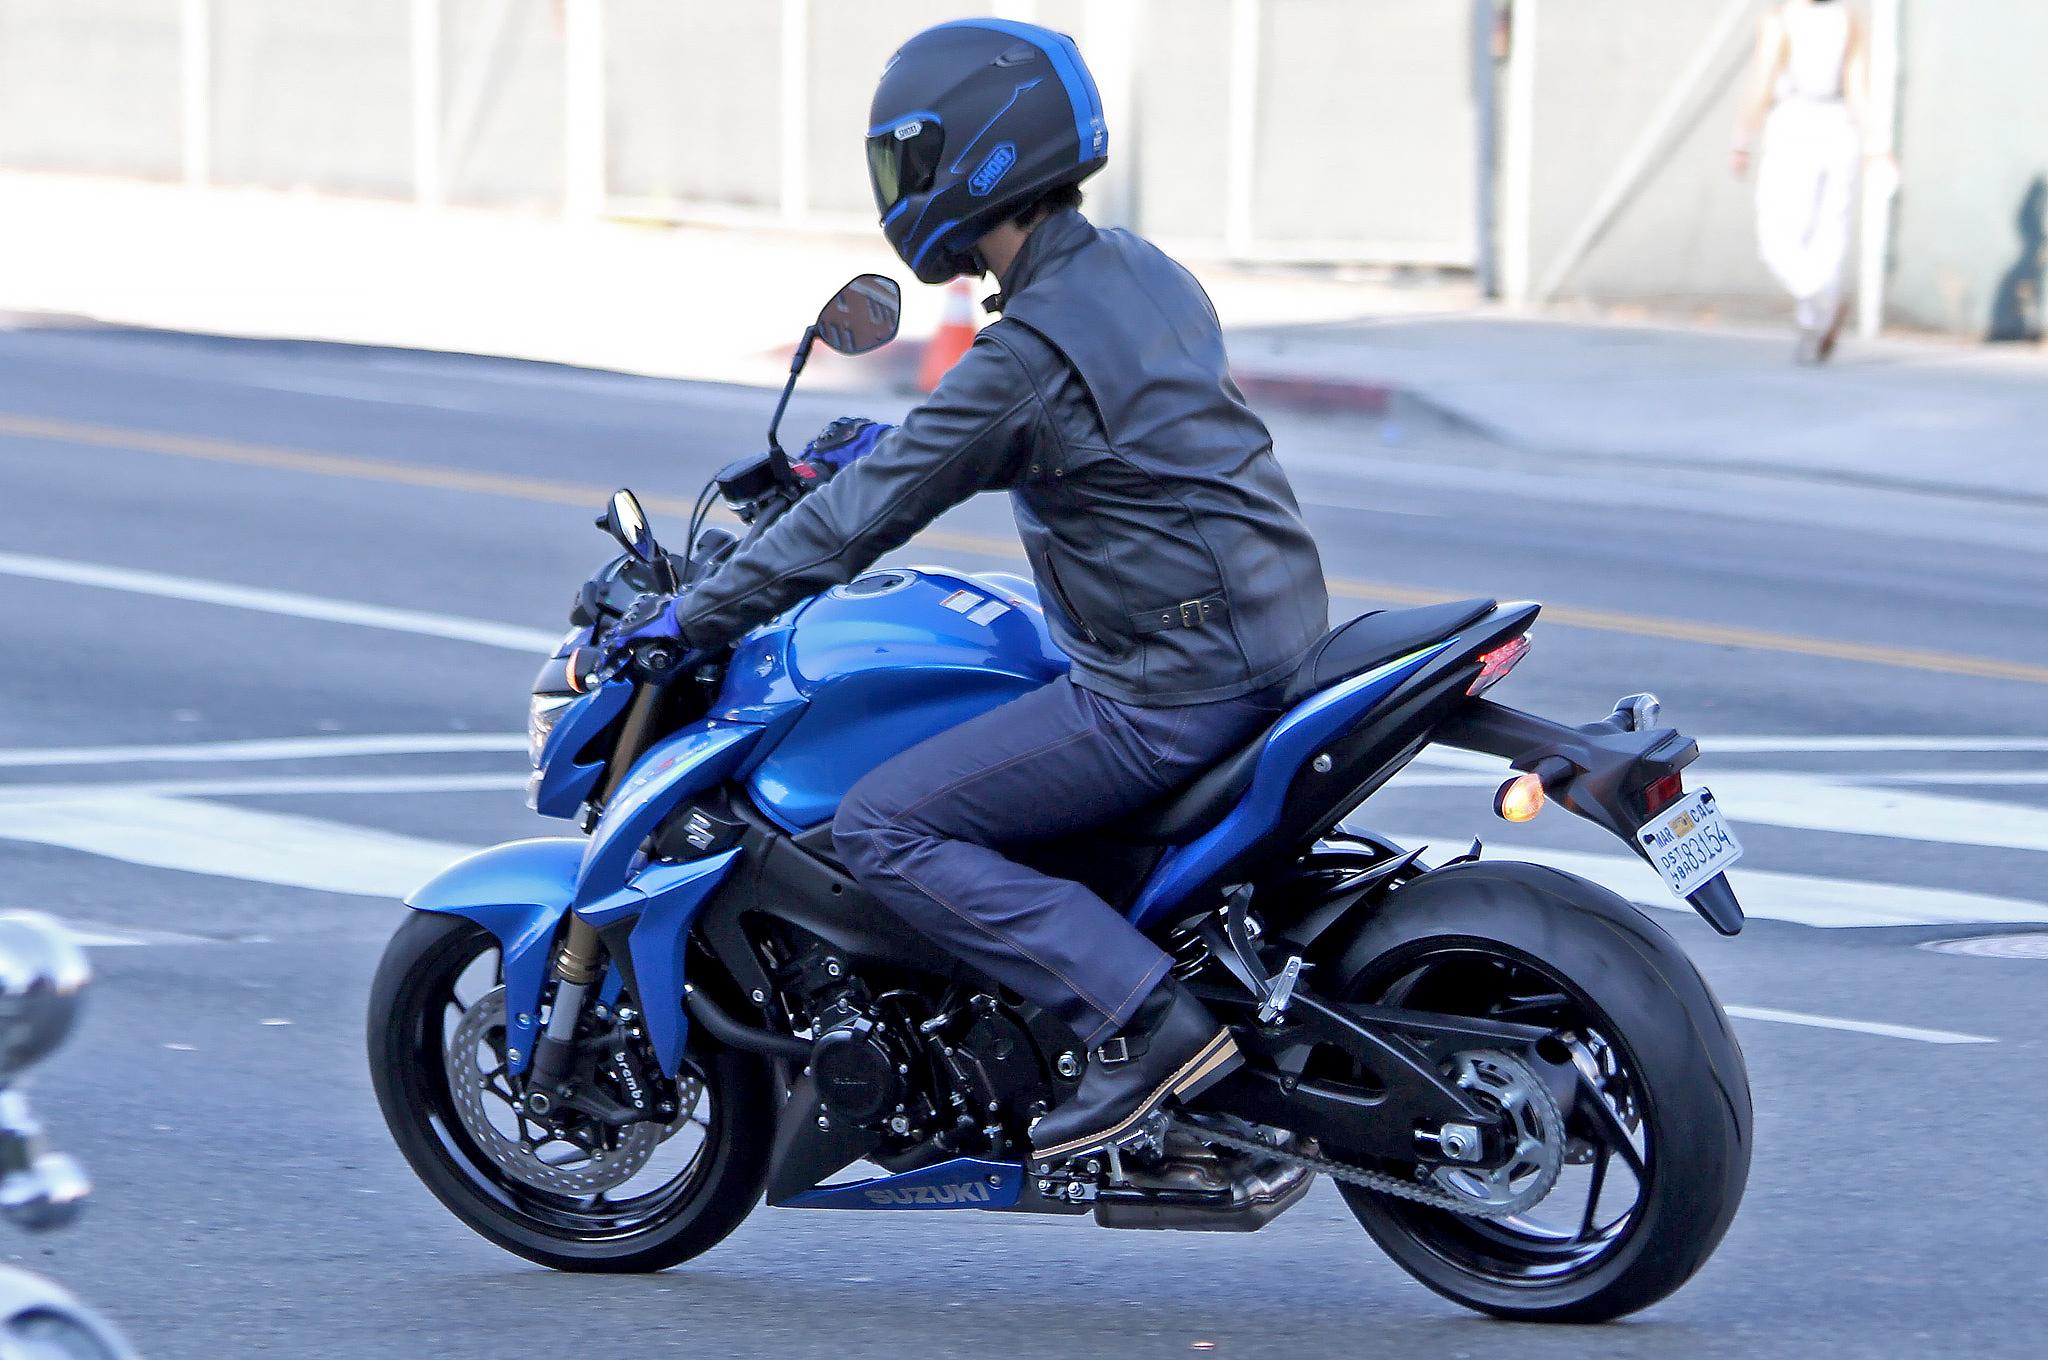 2015 suzuki gsx s1000 high resolution pics show bike ready for 1000 150